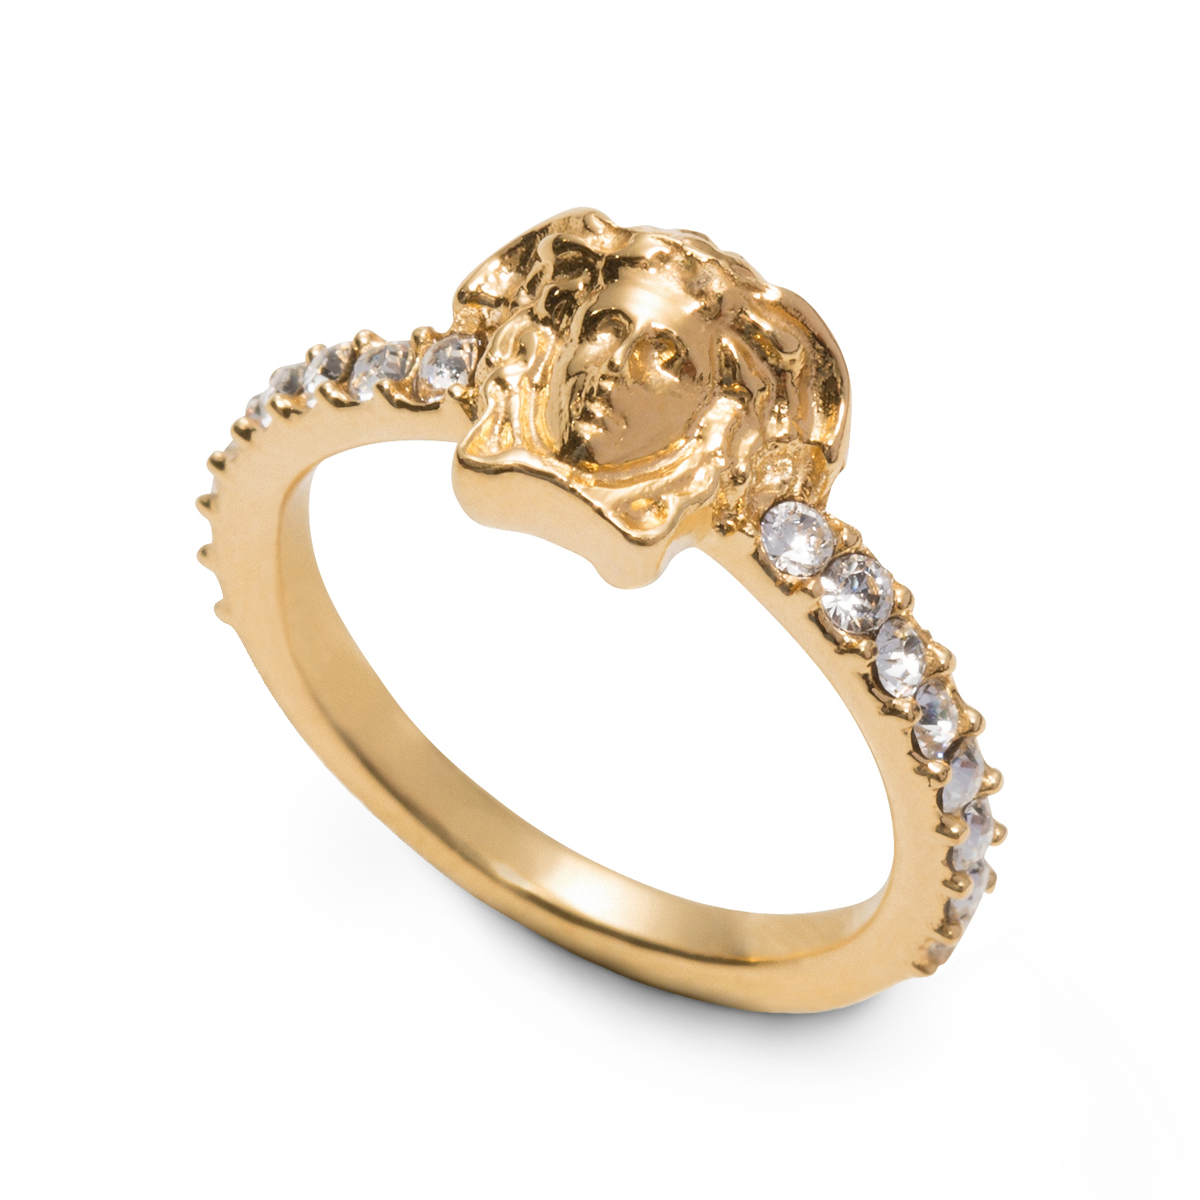 Luxurious treat medusa band ring with swarovski crystal details